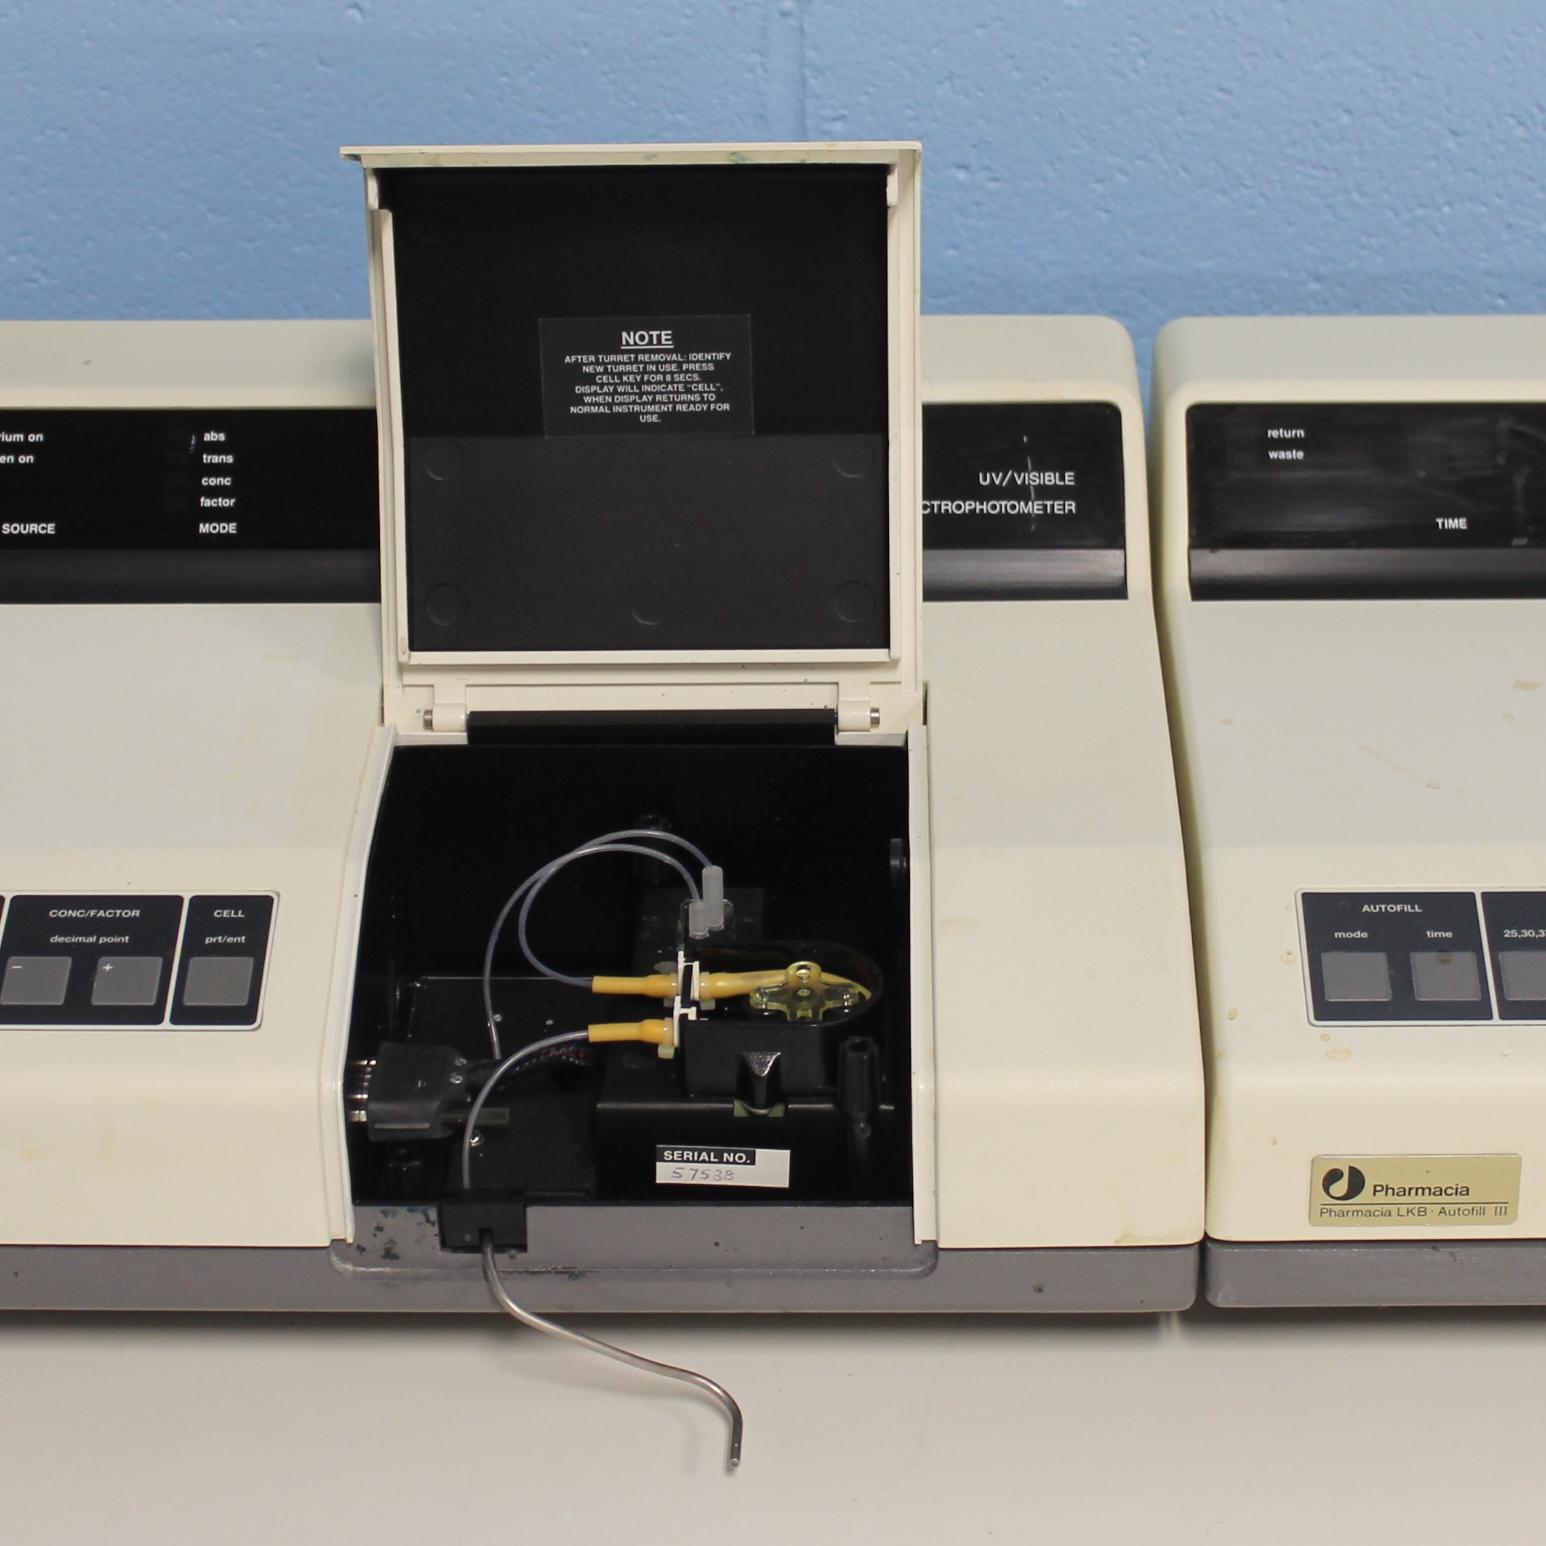 Ultrospec III UV/Vis Spectrophotometer with  Autofill III Name